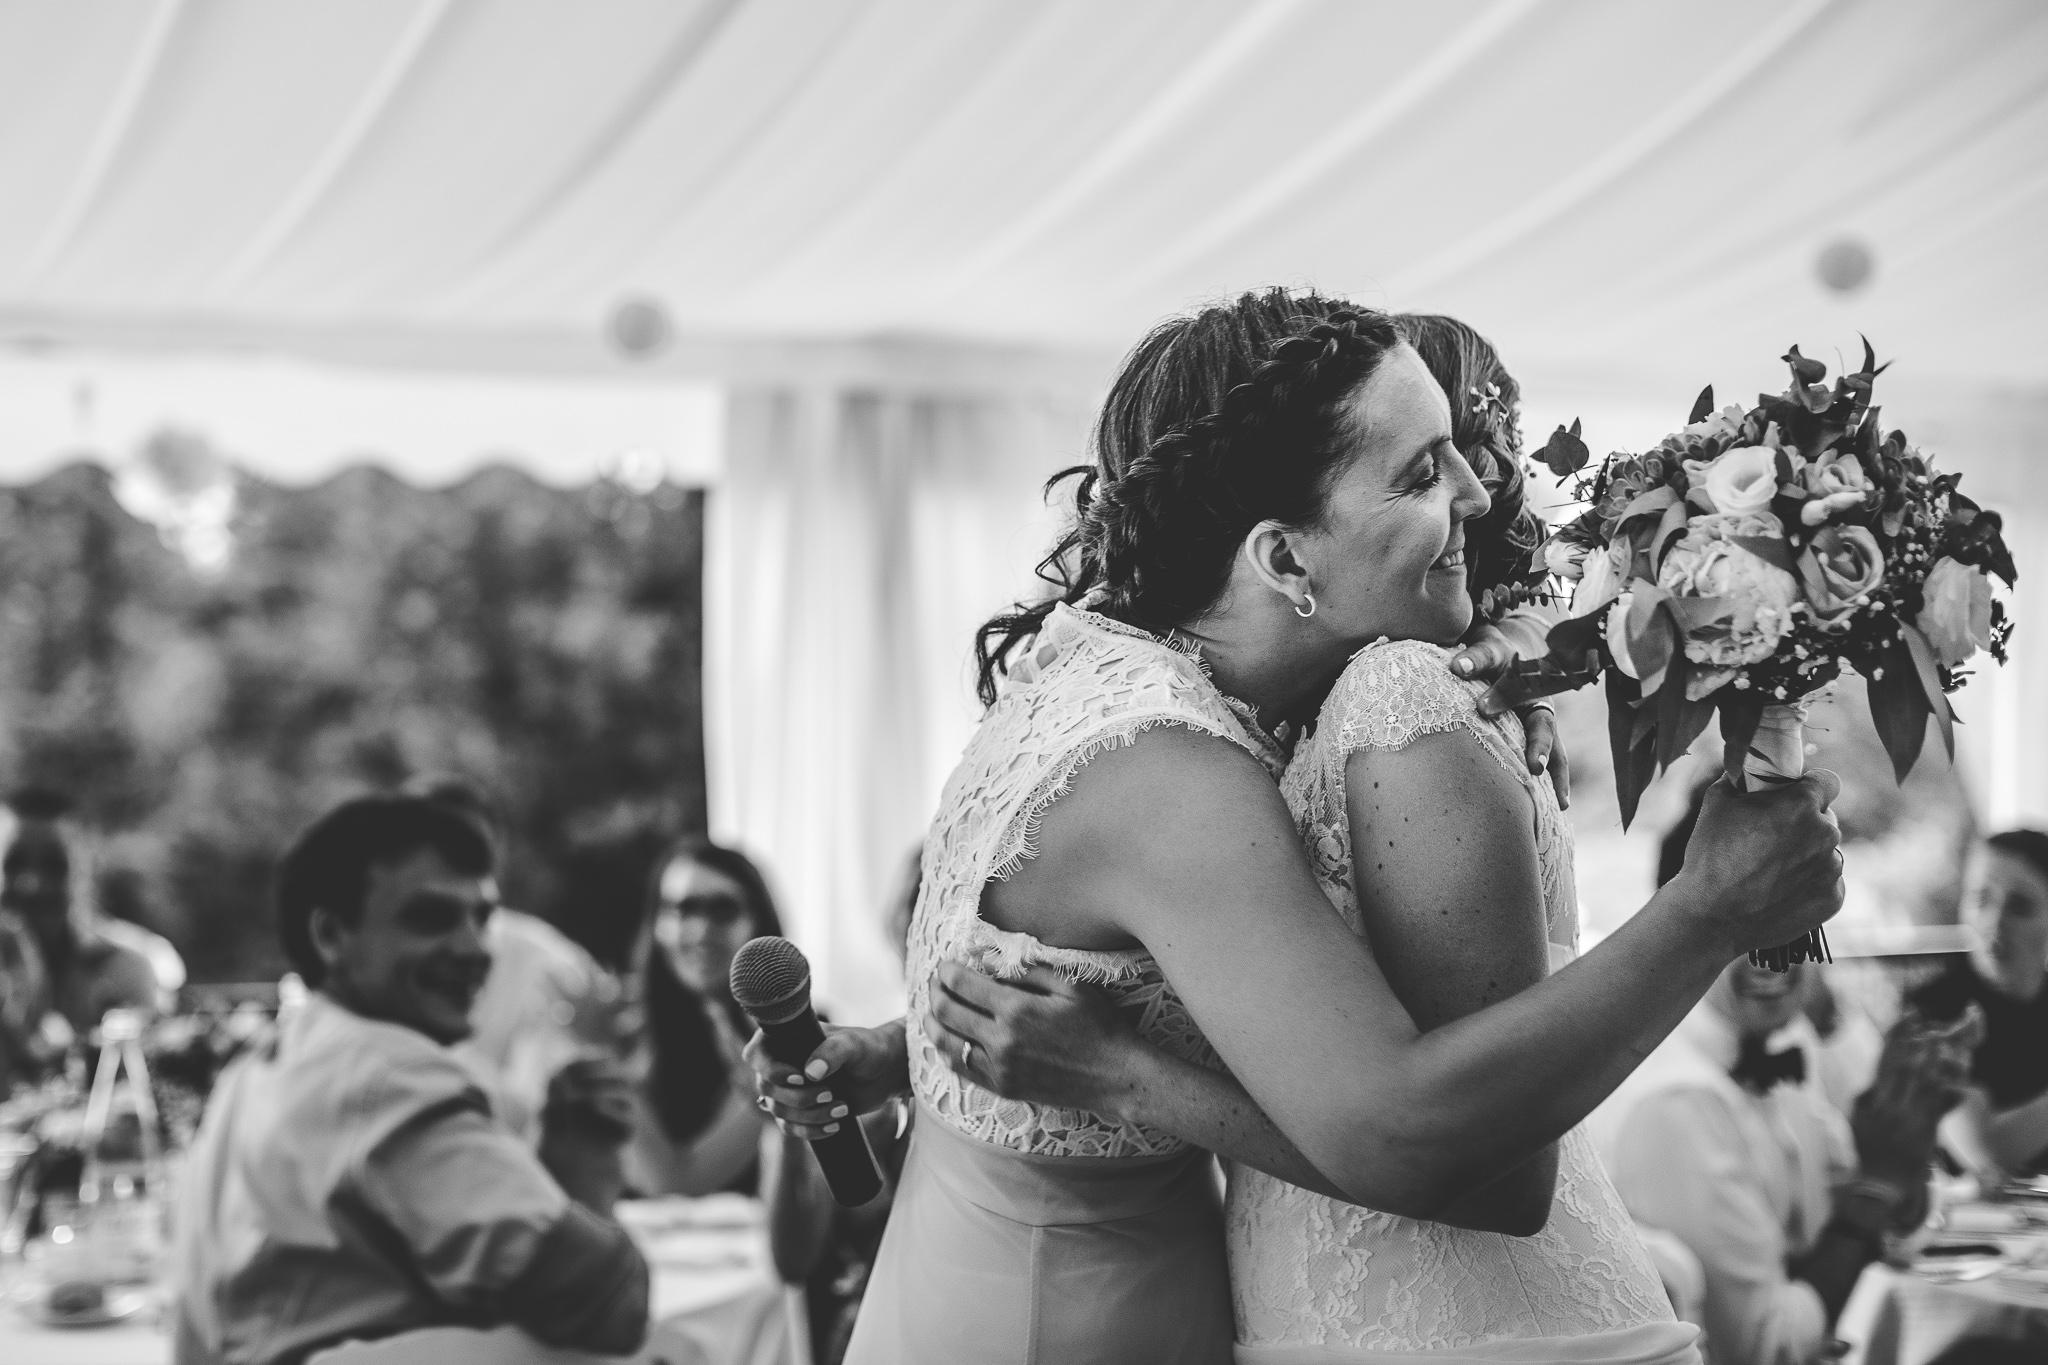 reportage mariage photo soiree instantane photo mariee temoin bouquet cadeau chateau launac toulouse